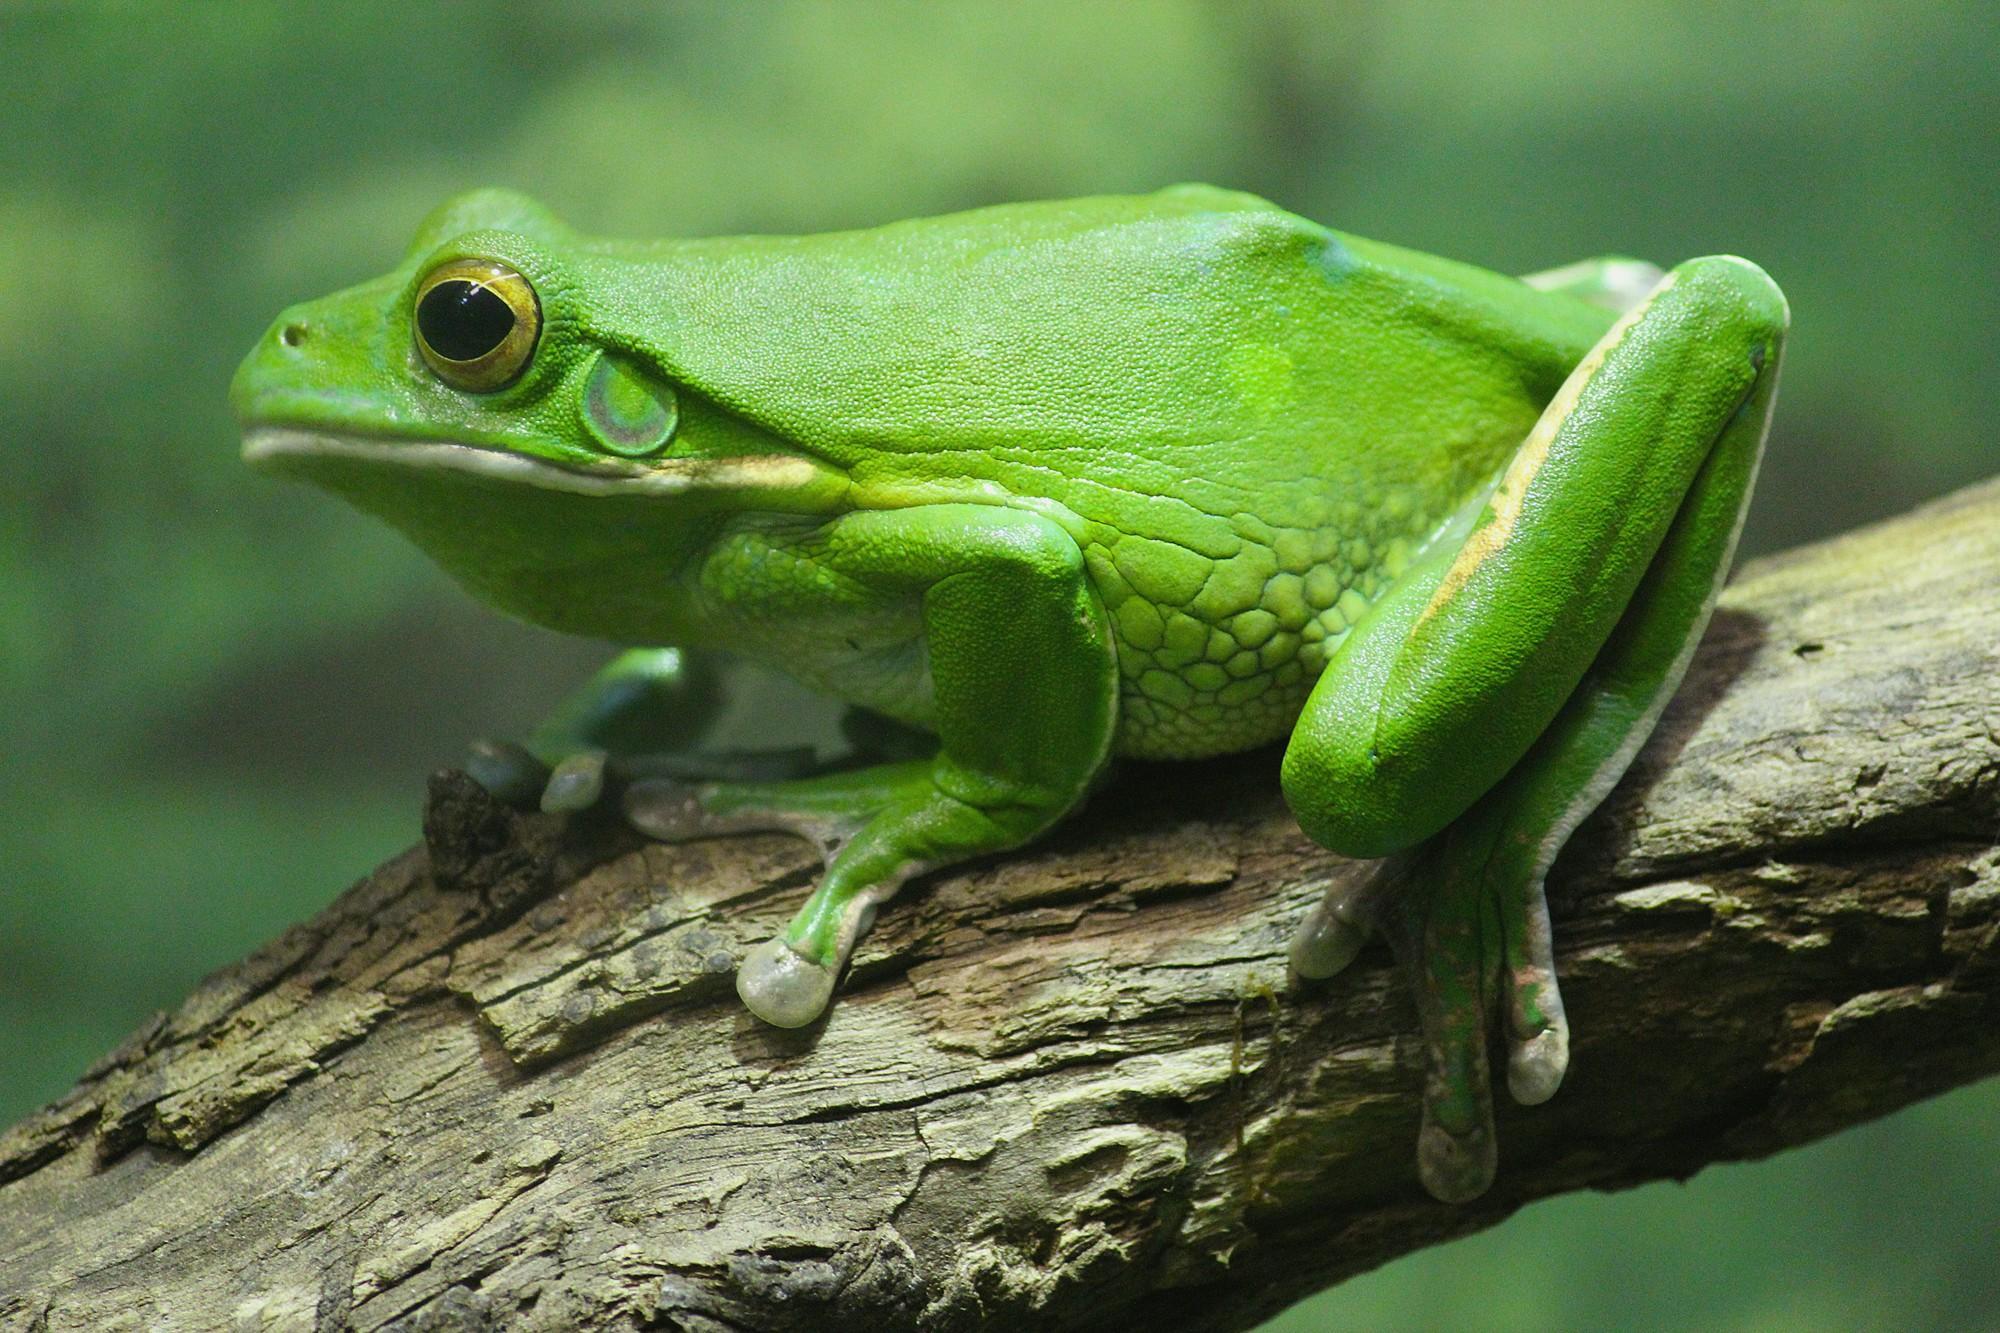 Frog Wallpaper HD Download